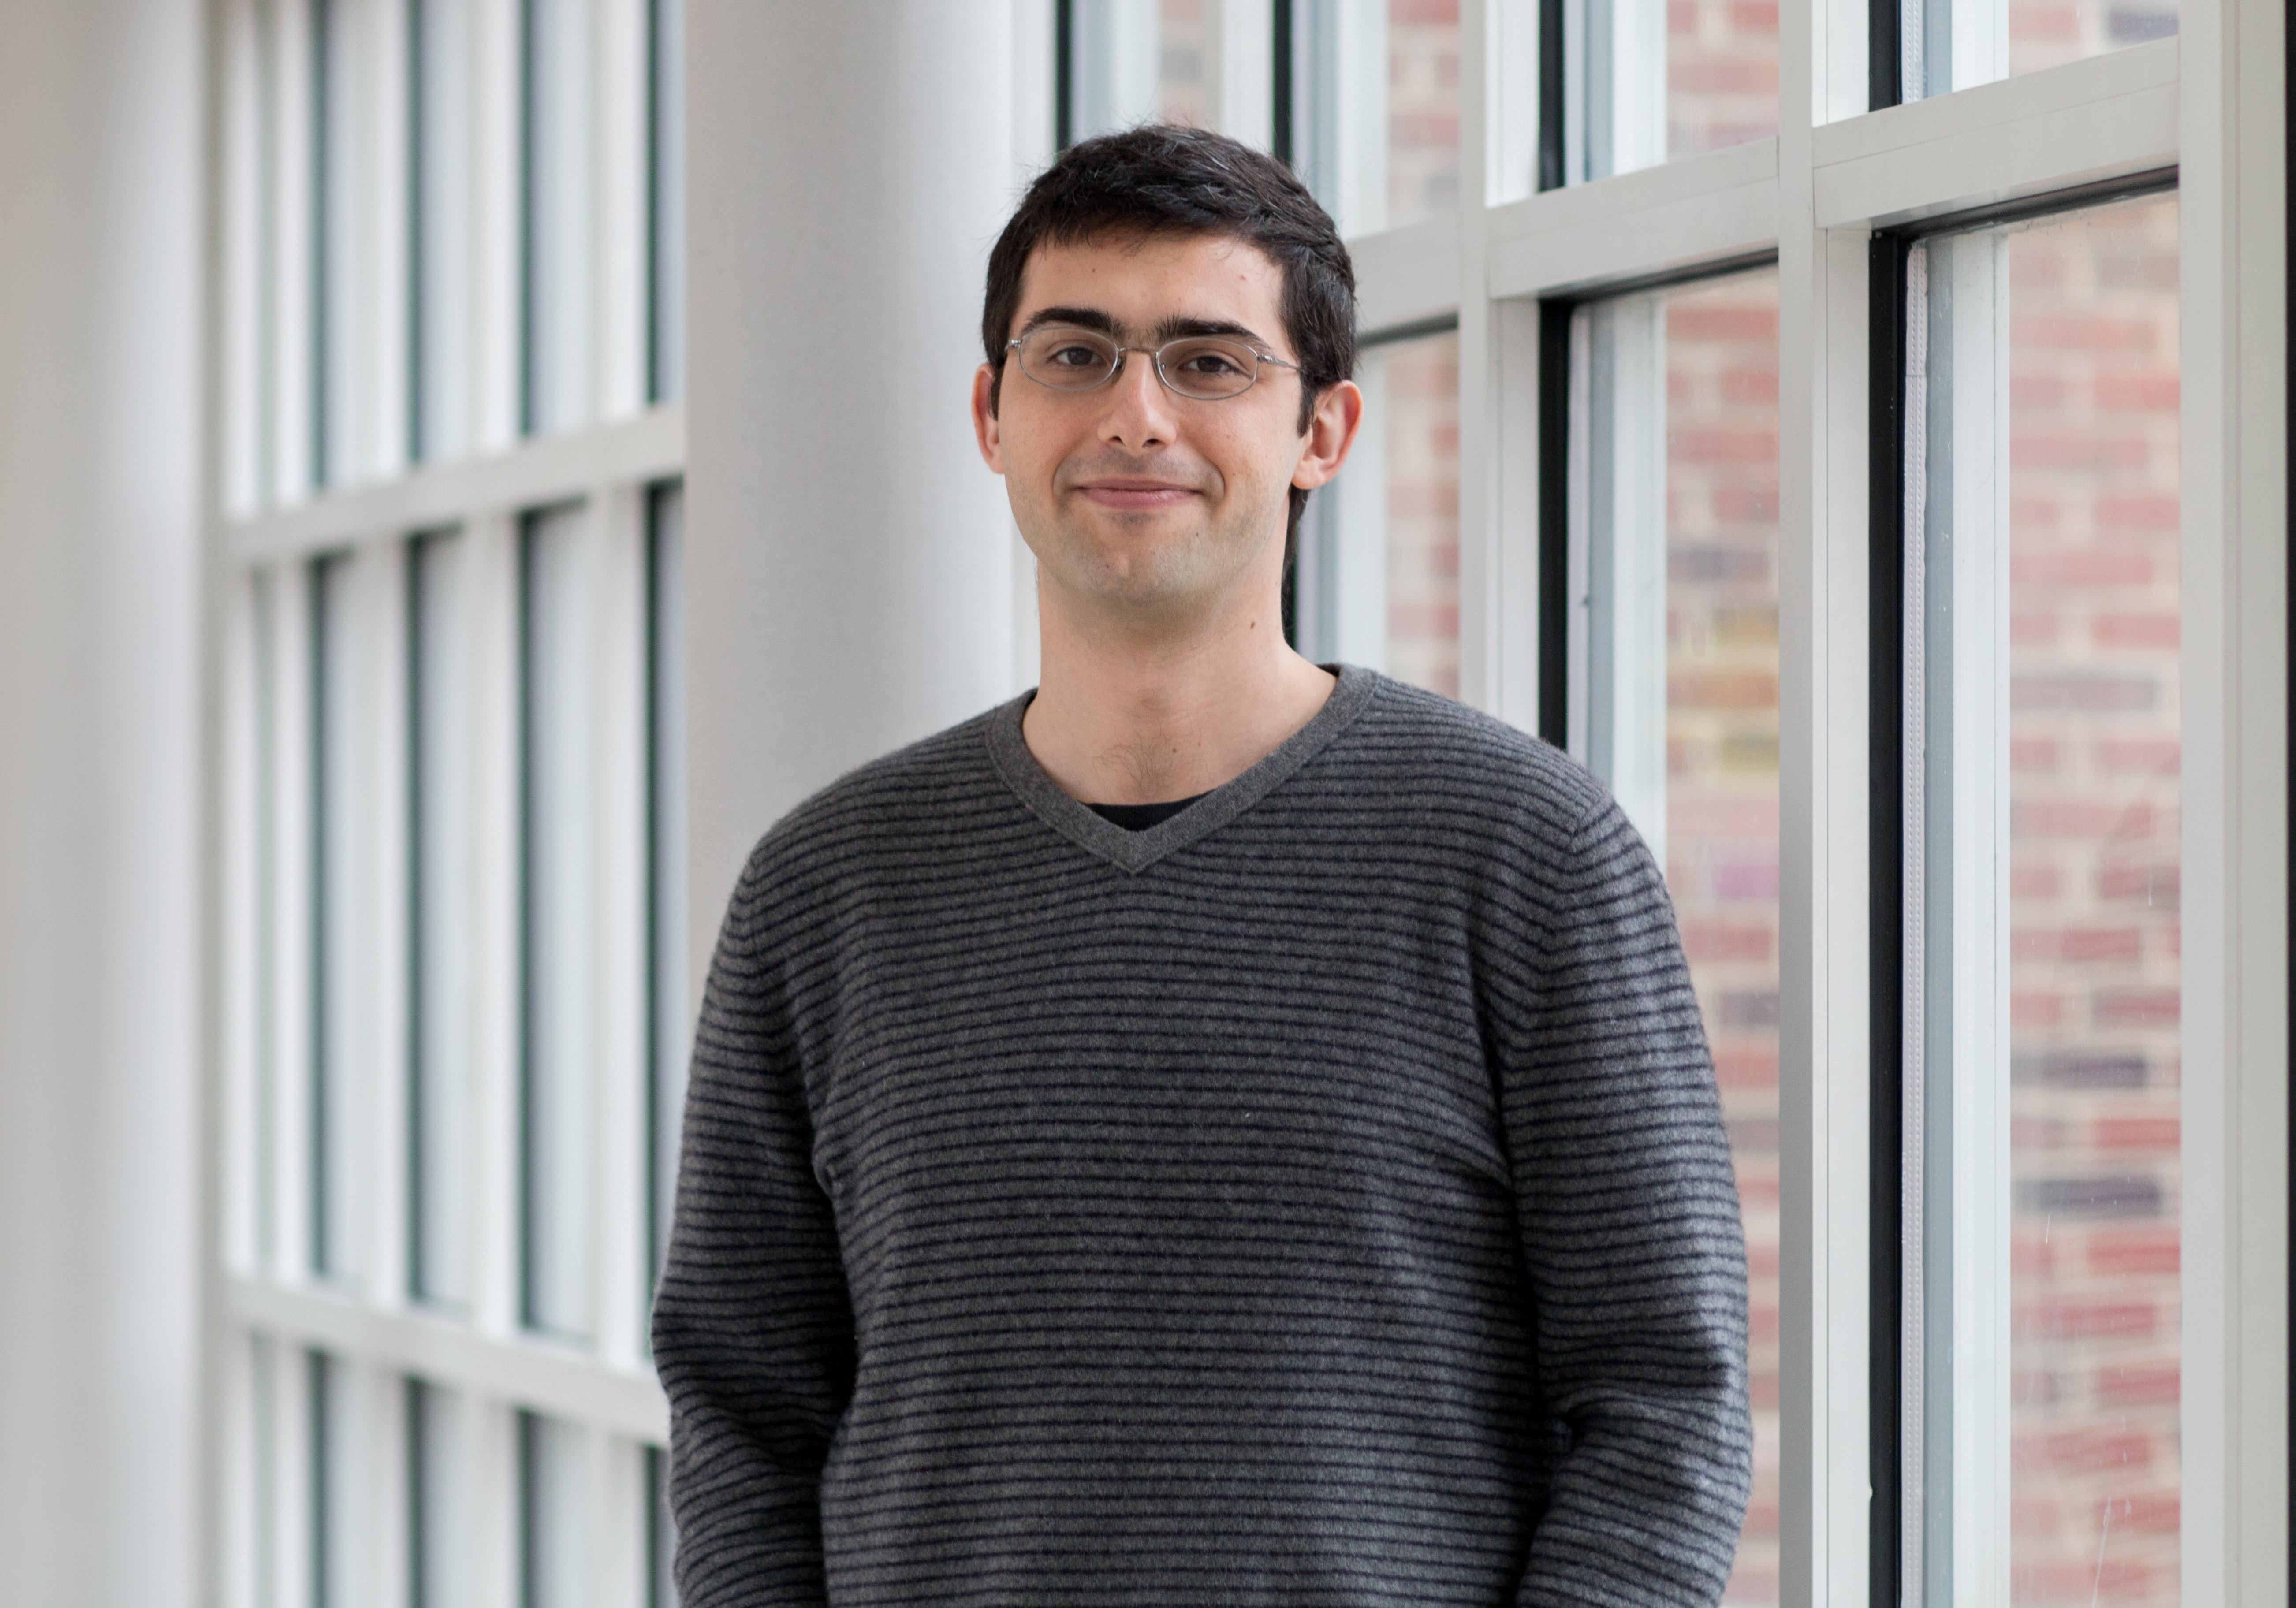 Descriptive image for Garrett Katz named Assistant Professor at Syracuse University